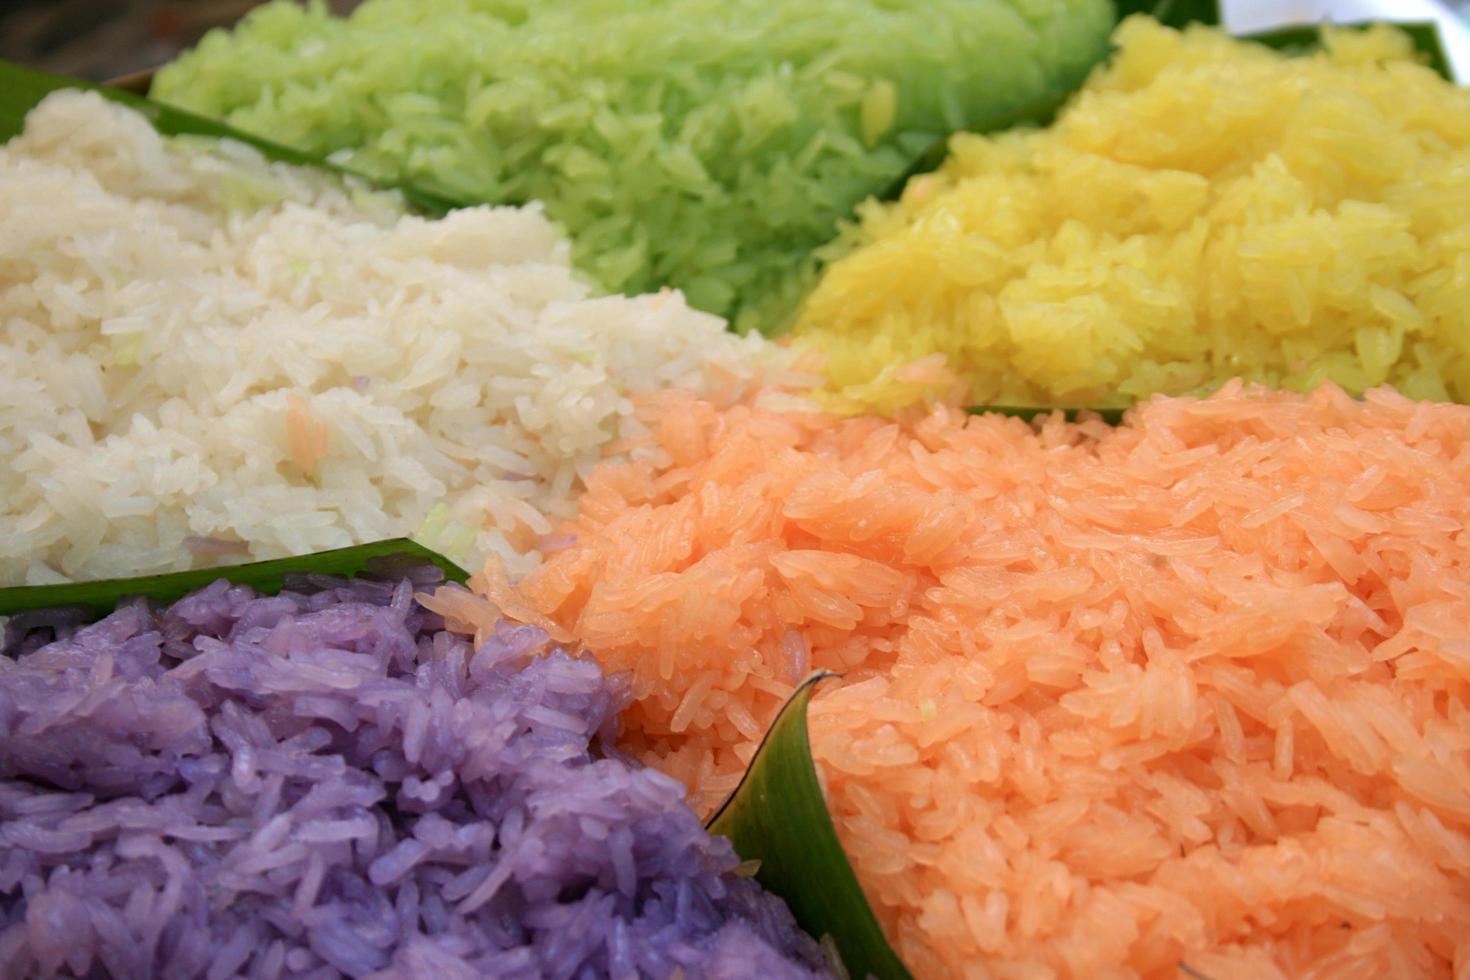 postre tailandés colorido foto